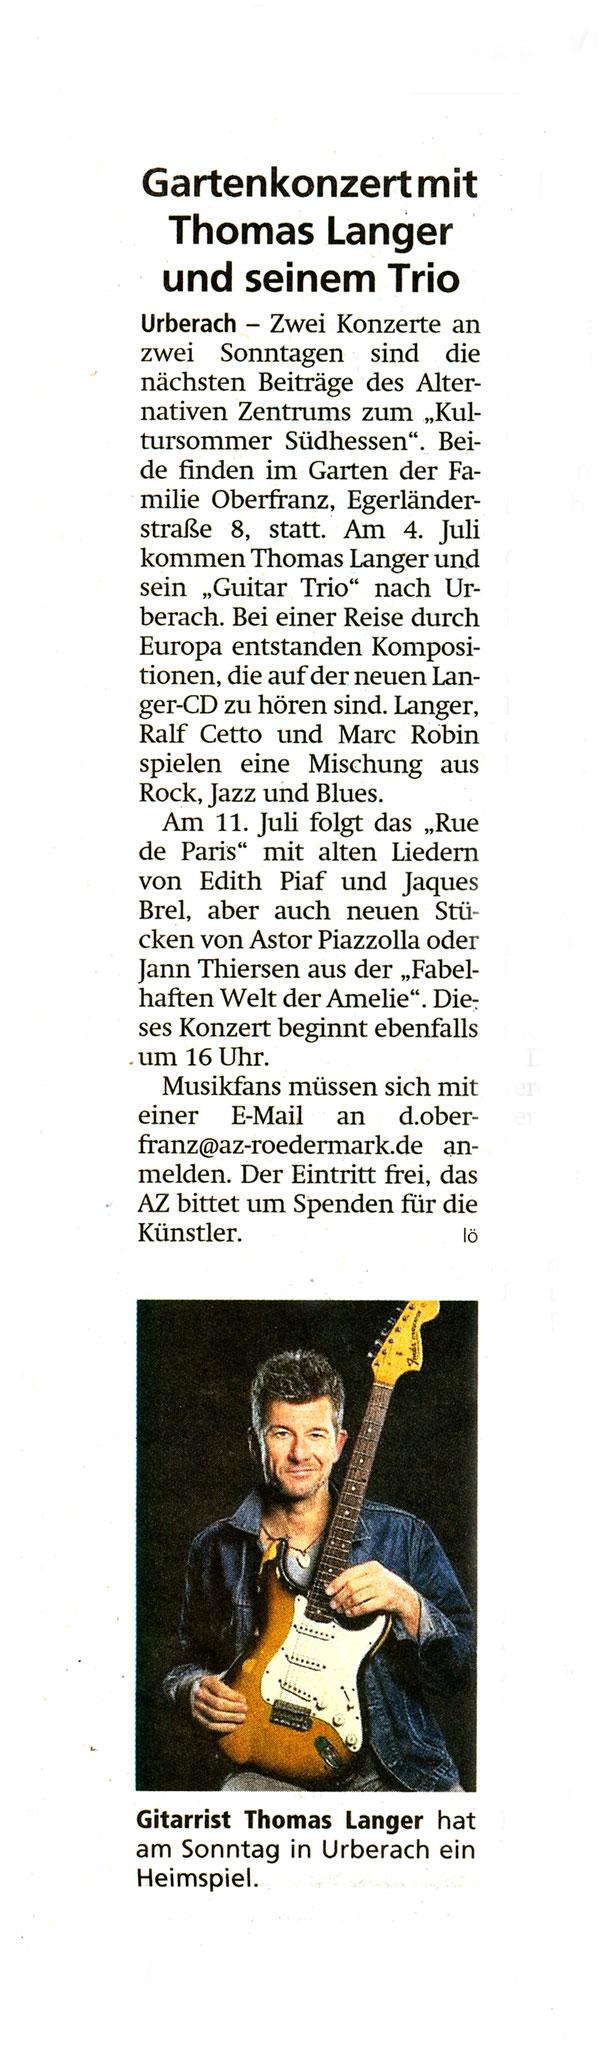 Offenbach Post, 1. Juli 2021